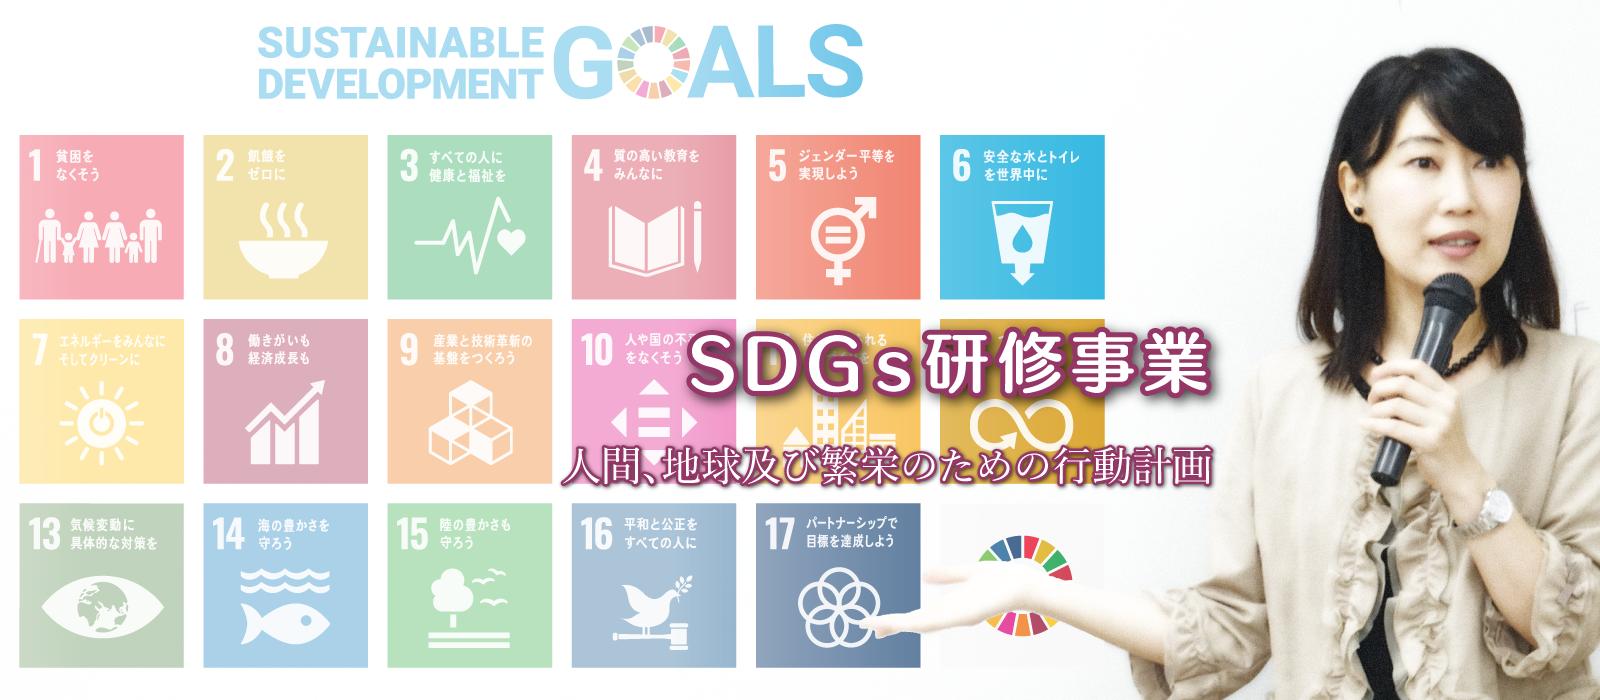 SDGs研修事業 人間、地球及び繁栄のための行動計画